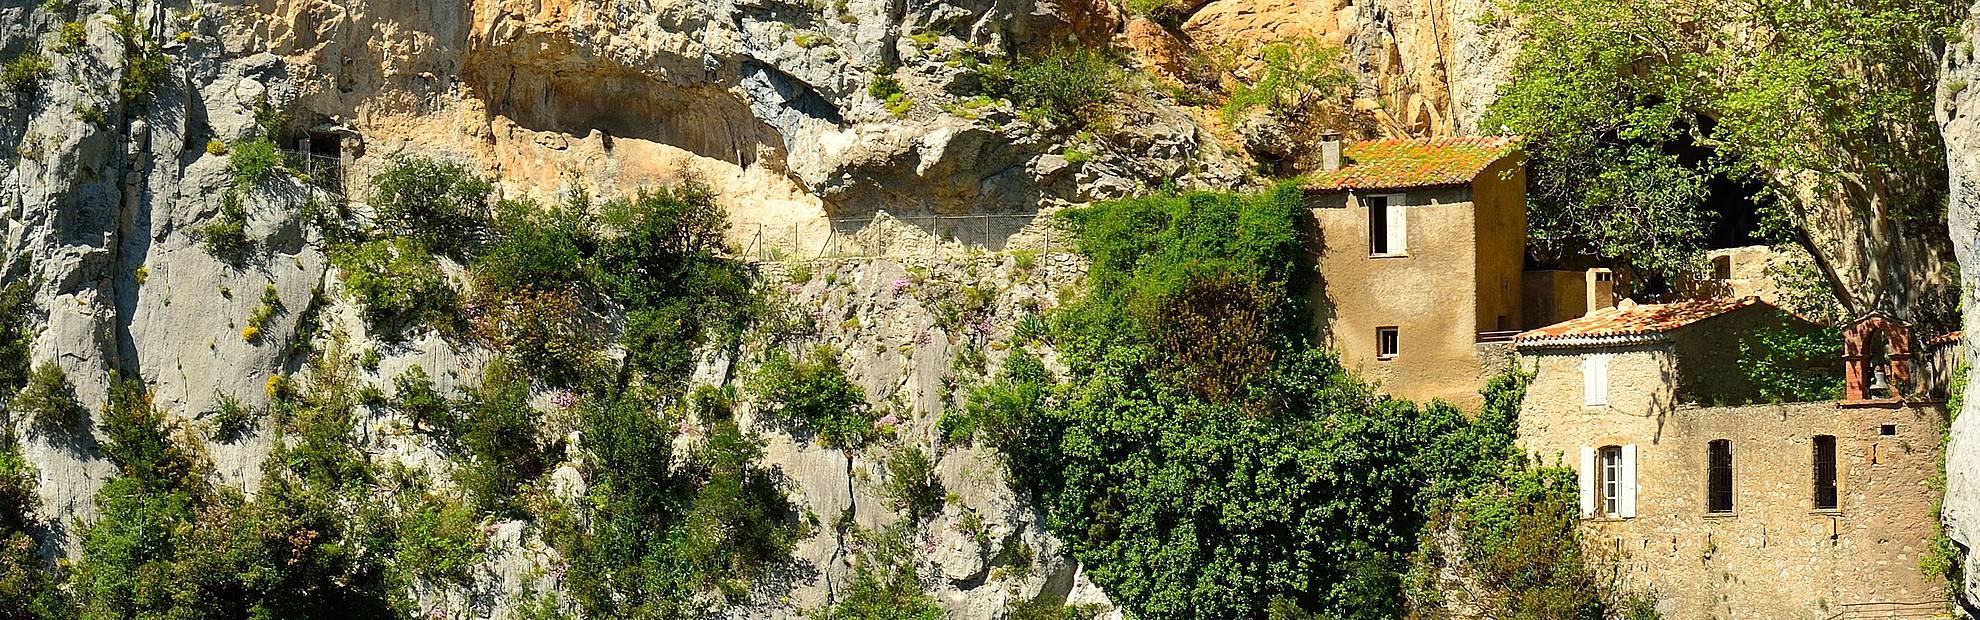 France (Languedoc Roussillon)